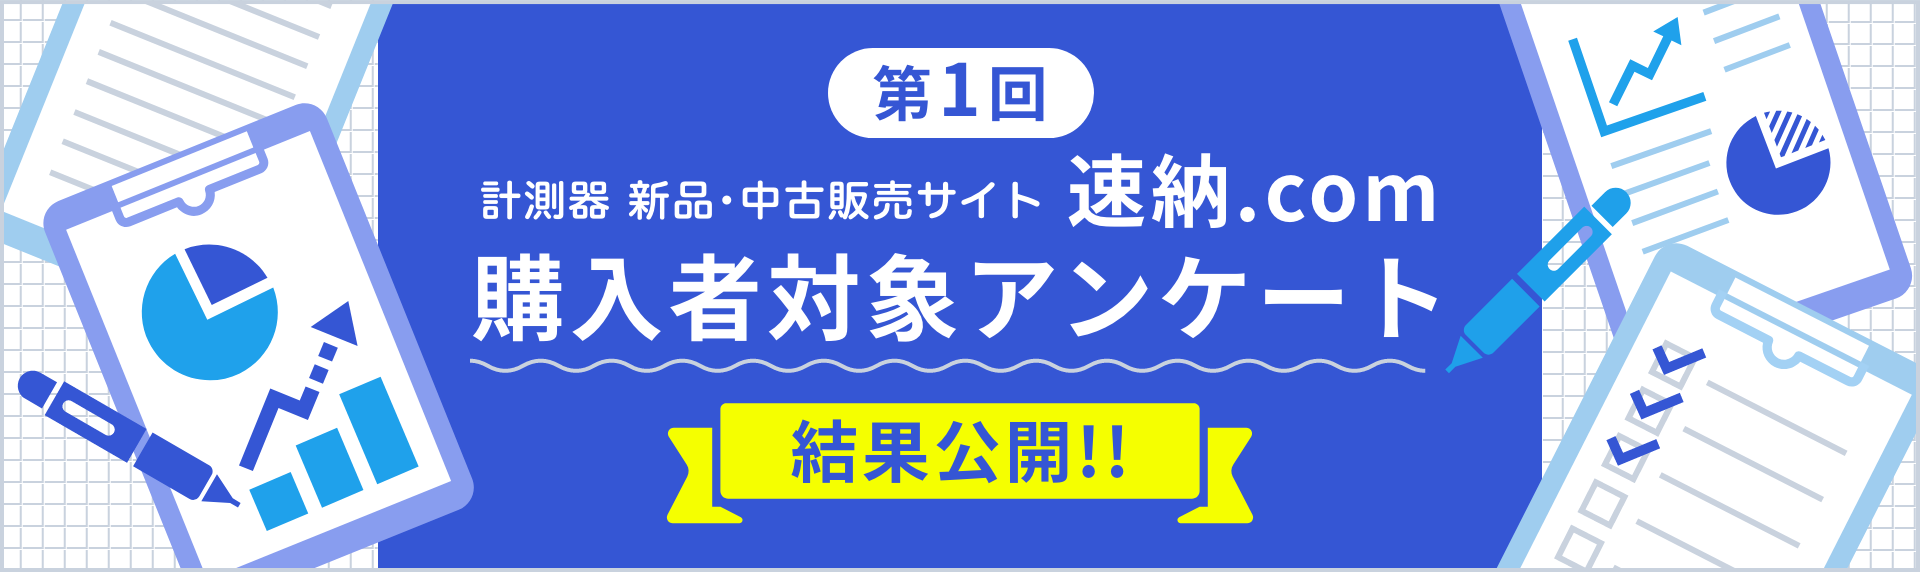 第1回 計測器 新品・中古販売サイト 速納.com 購入者対象アンケート 結果公開!!